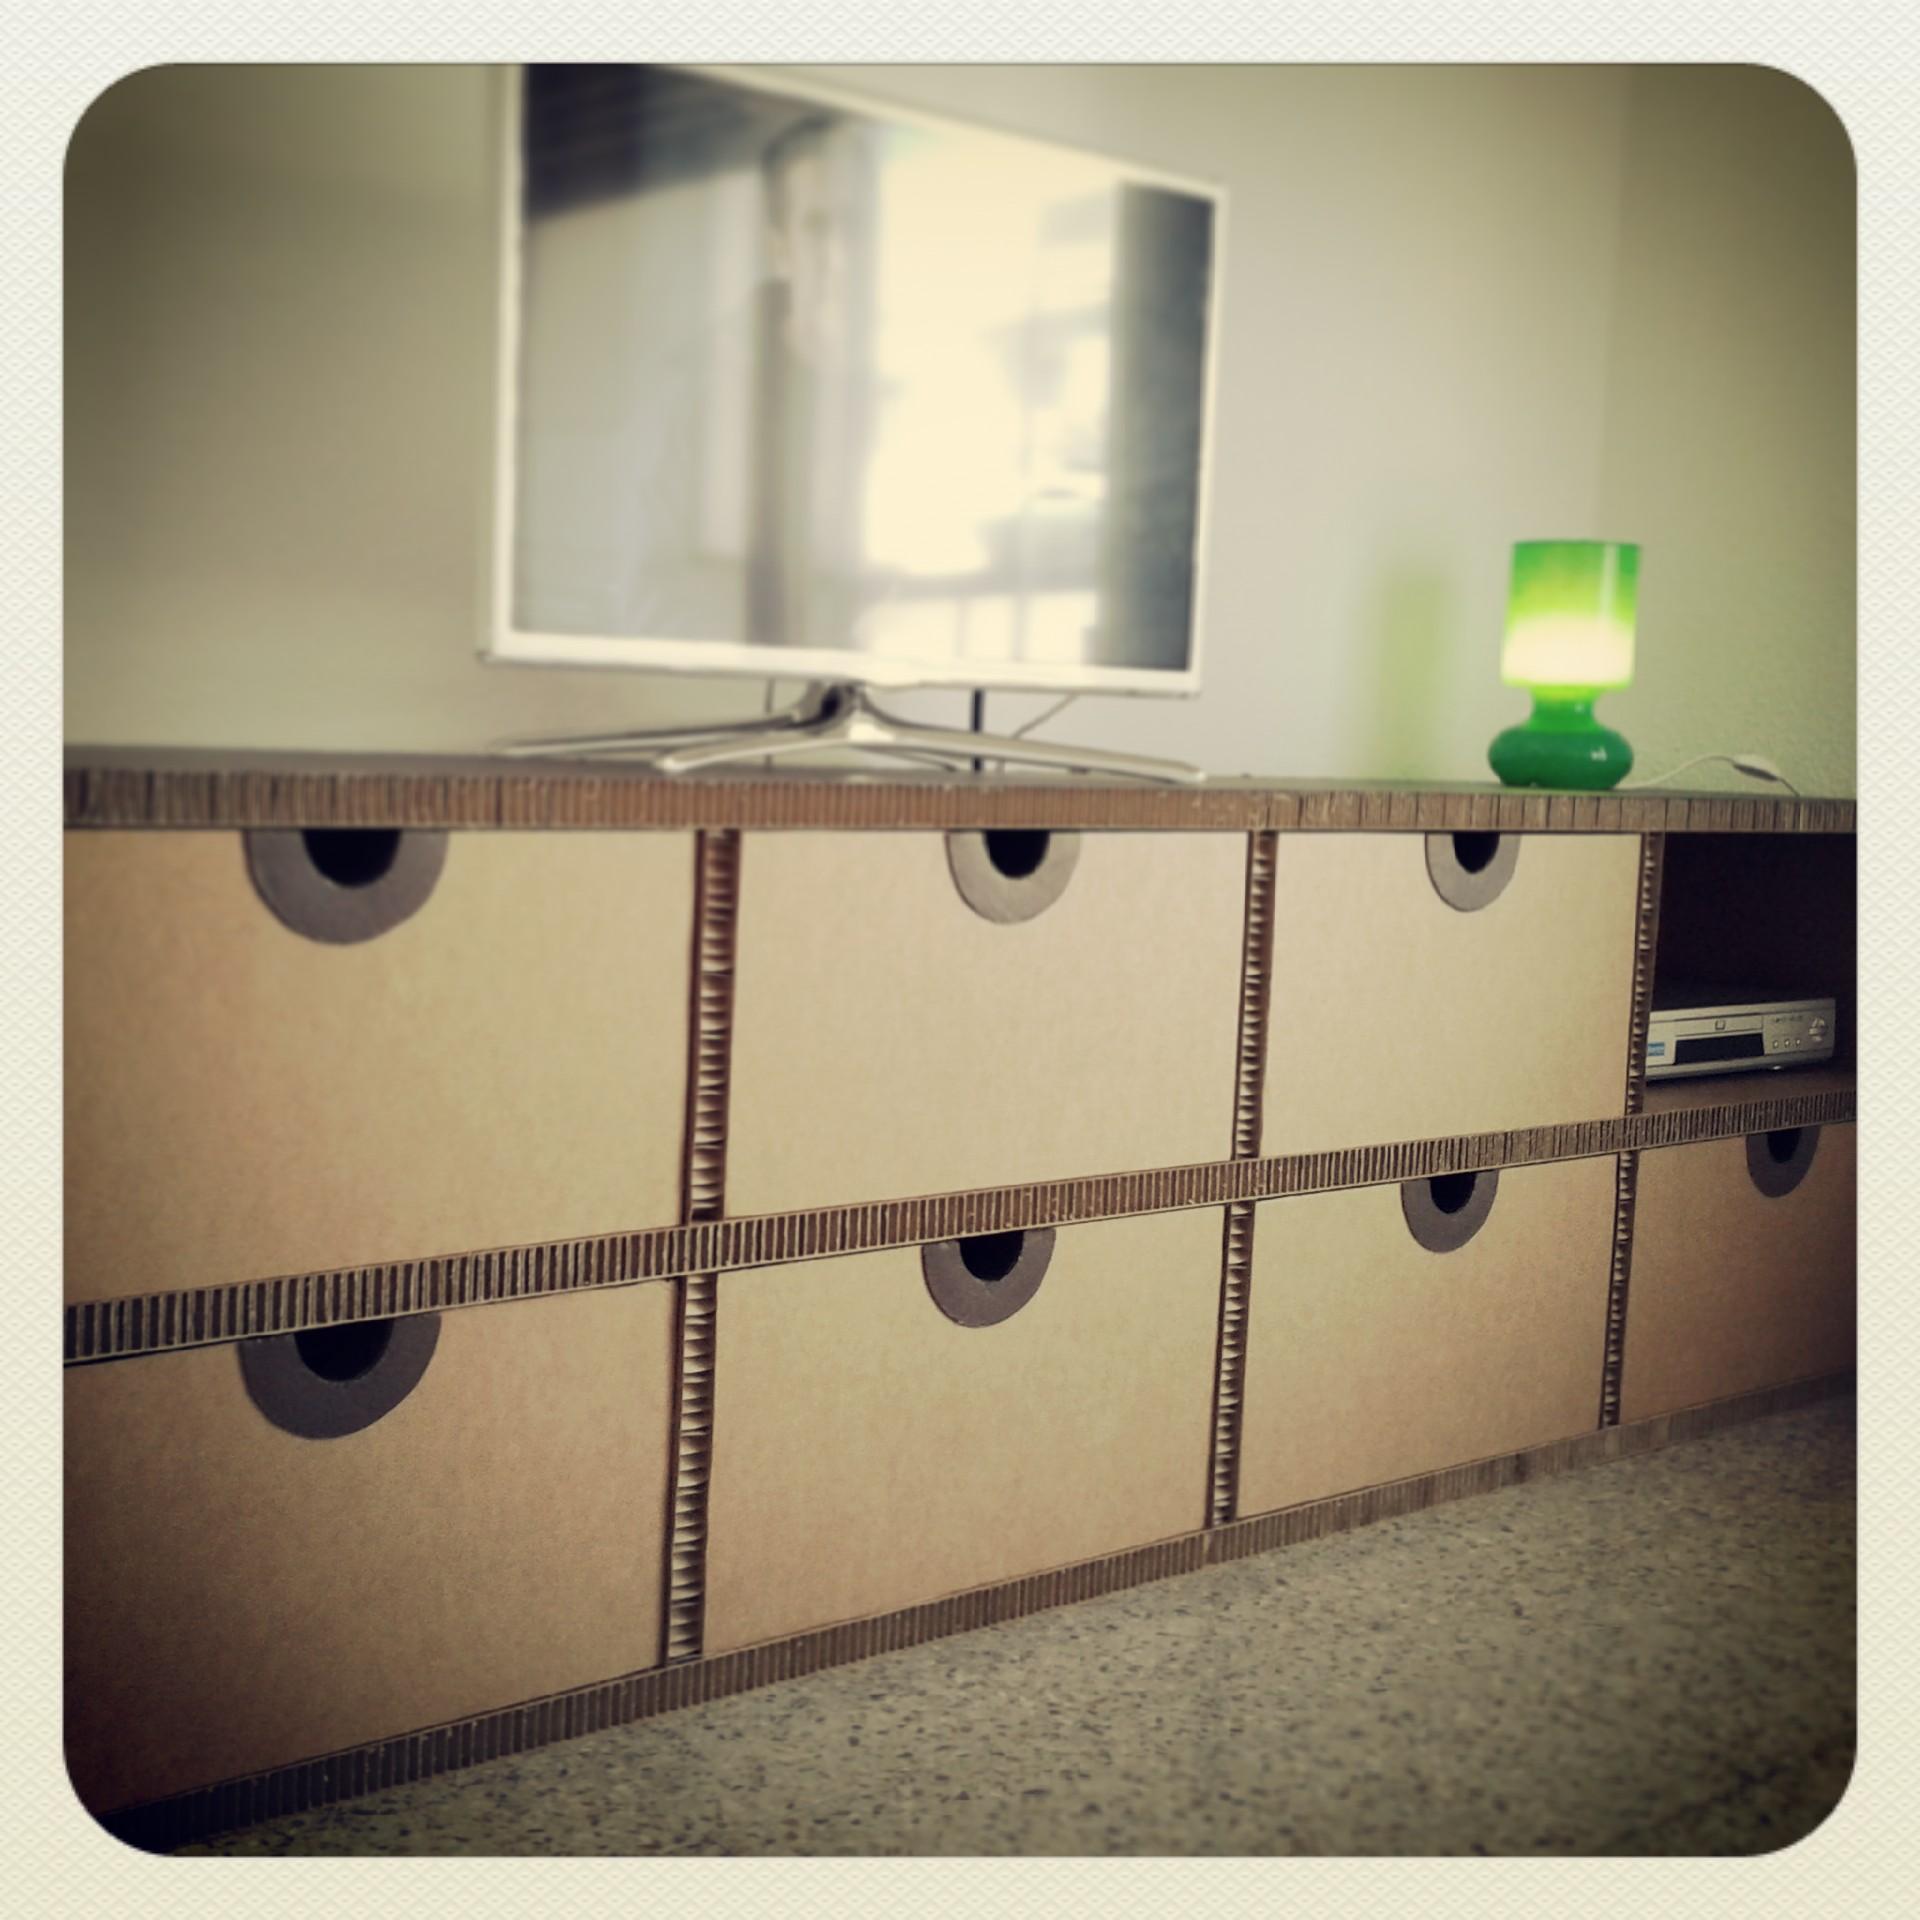 Muebles de cart n la cartoneria p gina 4 - Pagina de muebles ...